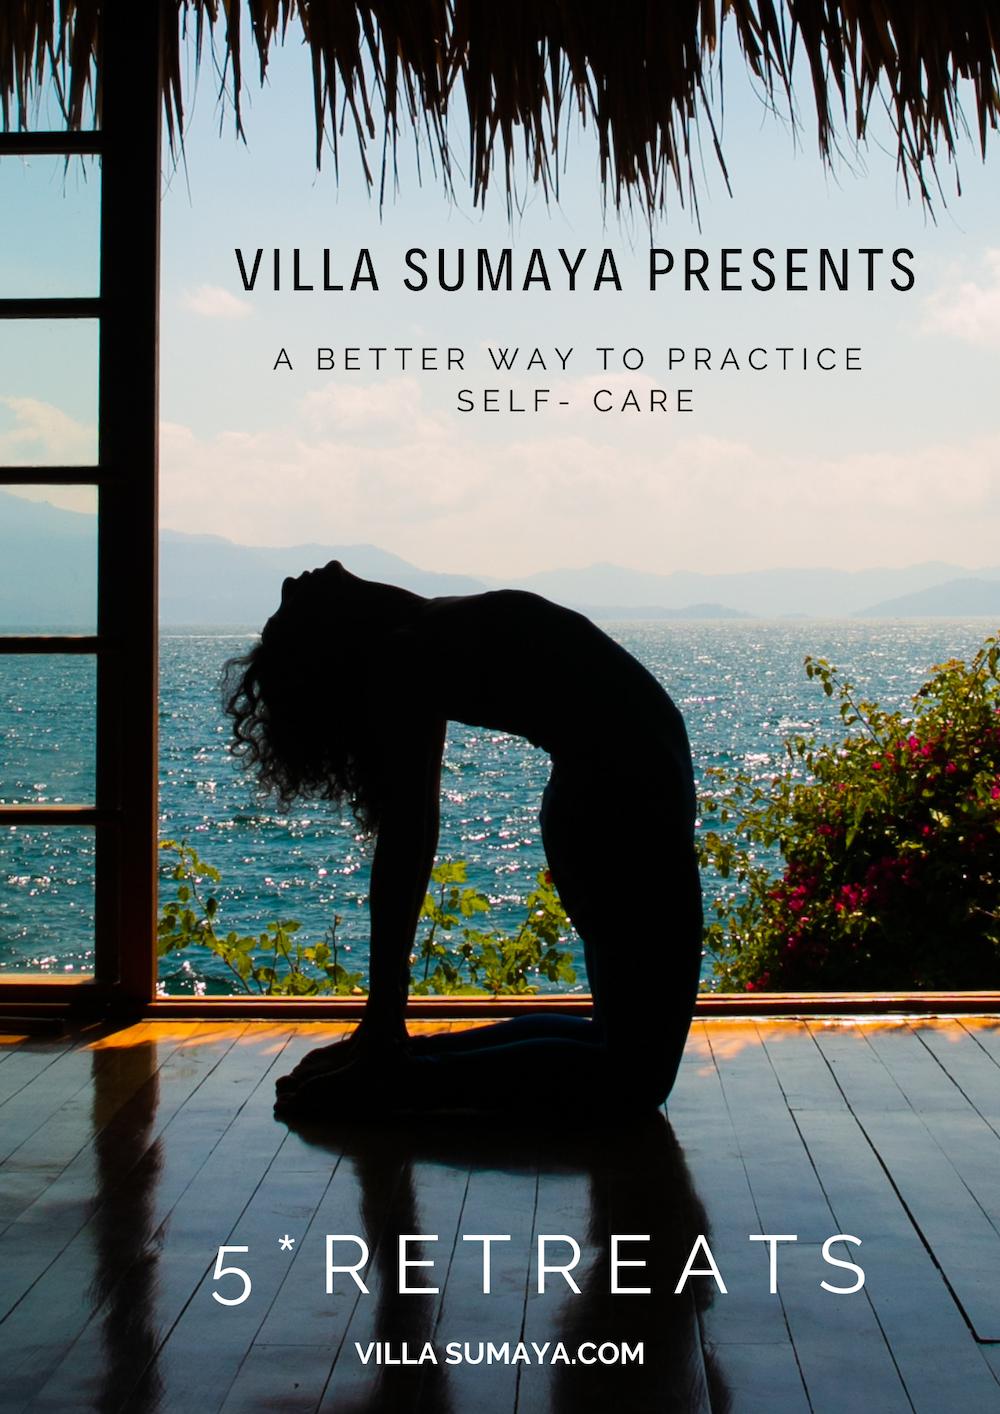 villa sumaya presents